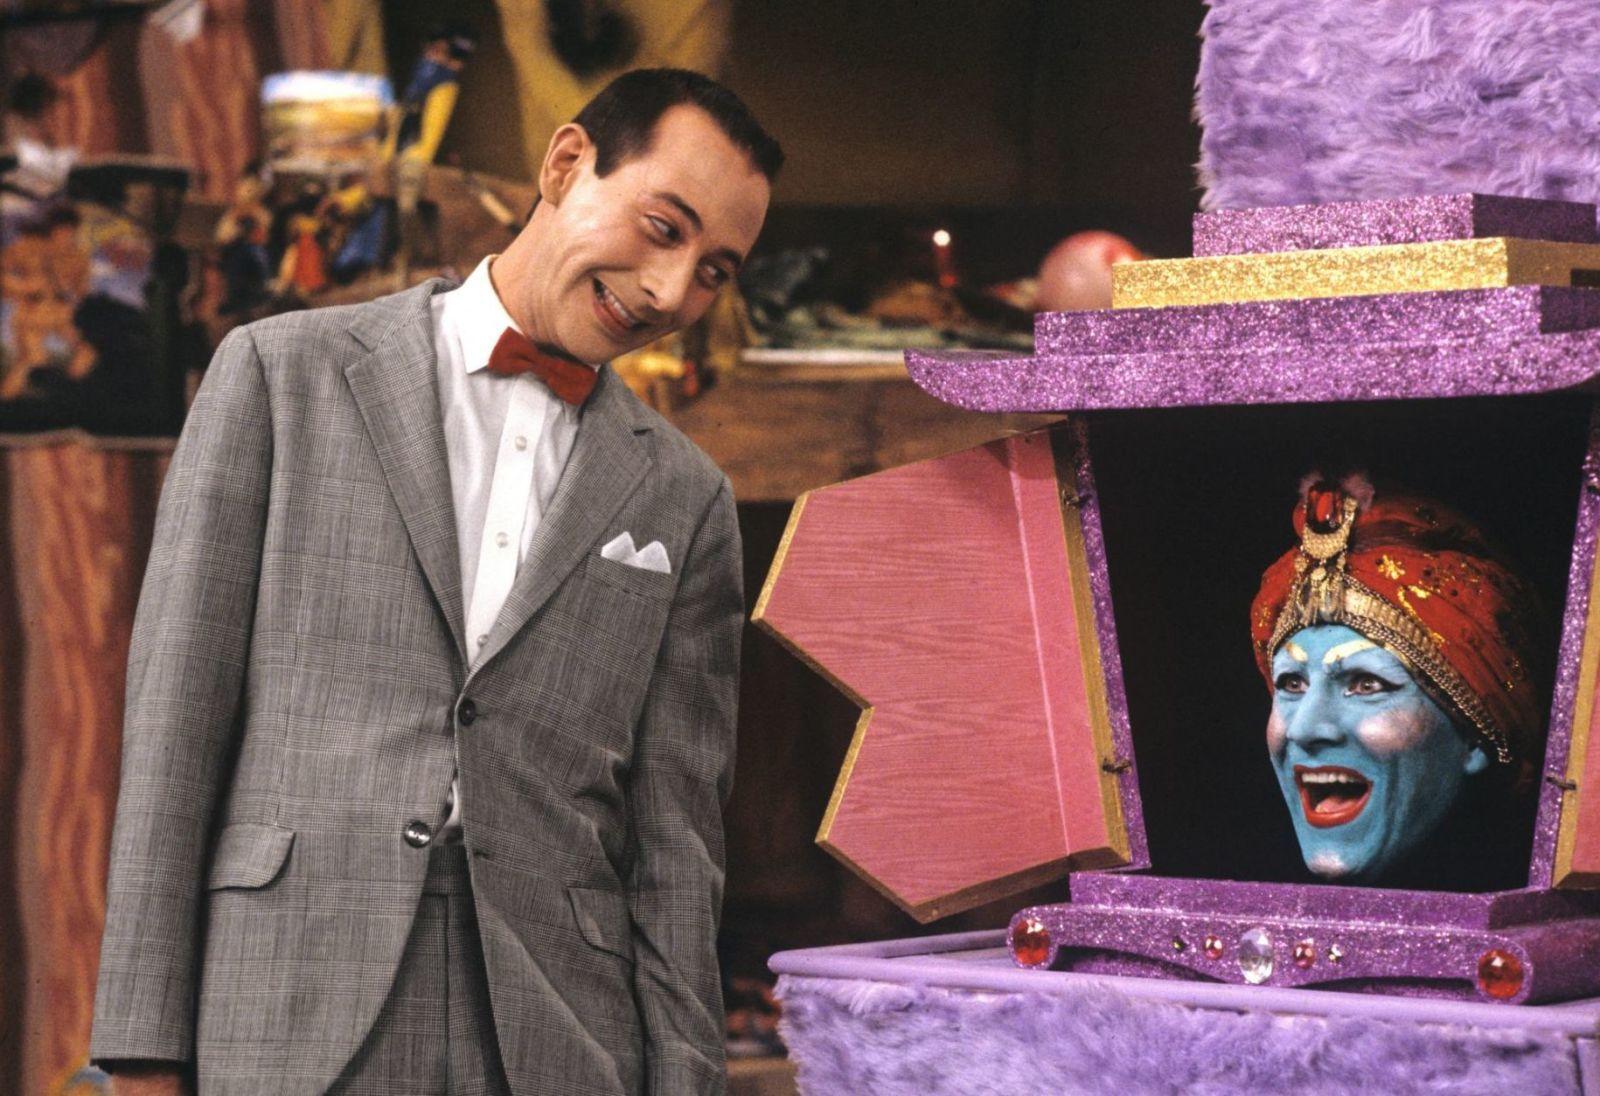 7 Things We Loved About Pee-wee's Playhouse - GoodHousekeeping.com